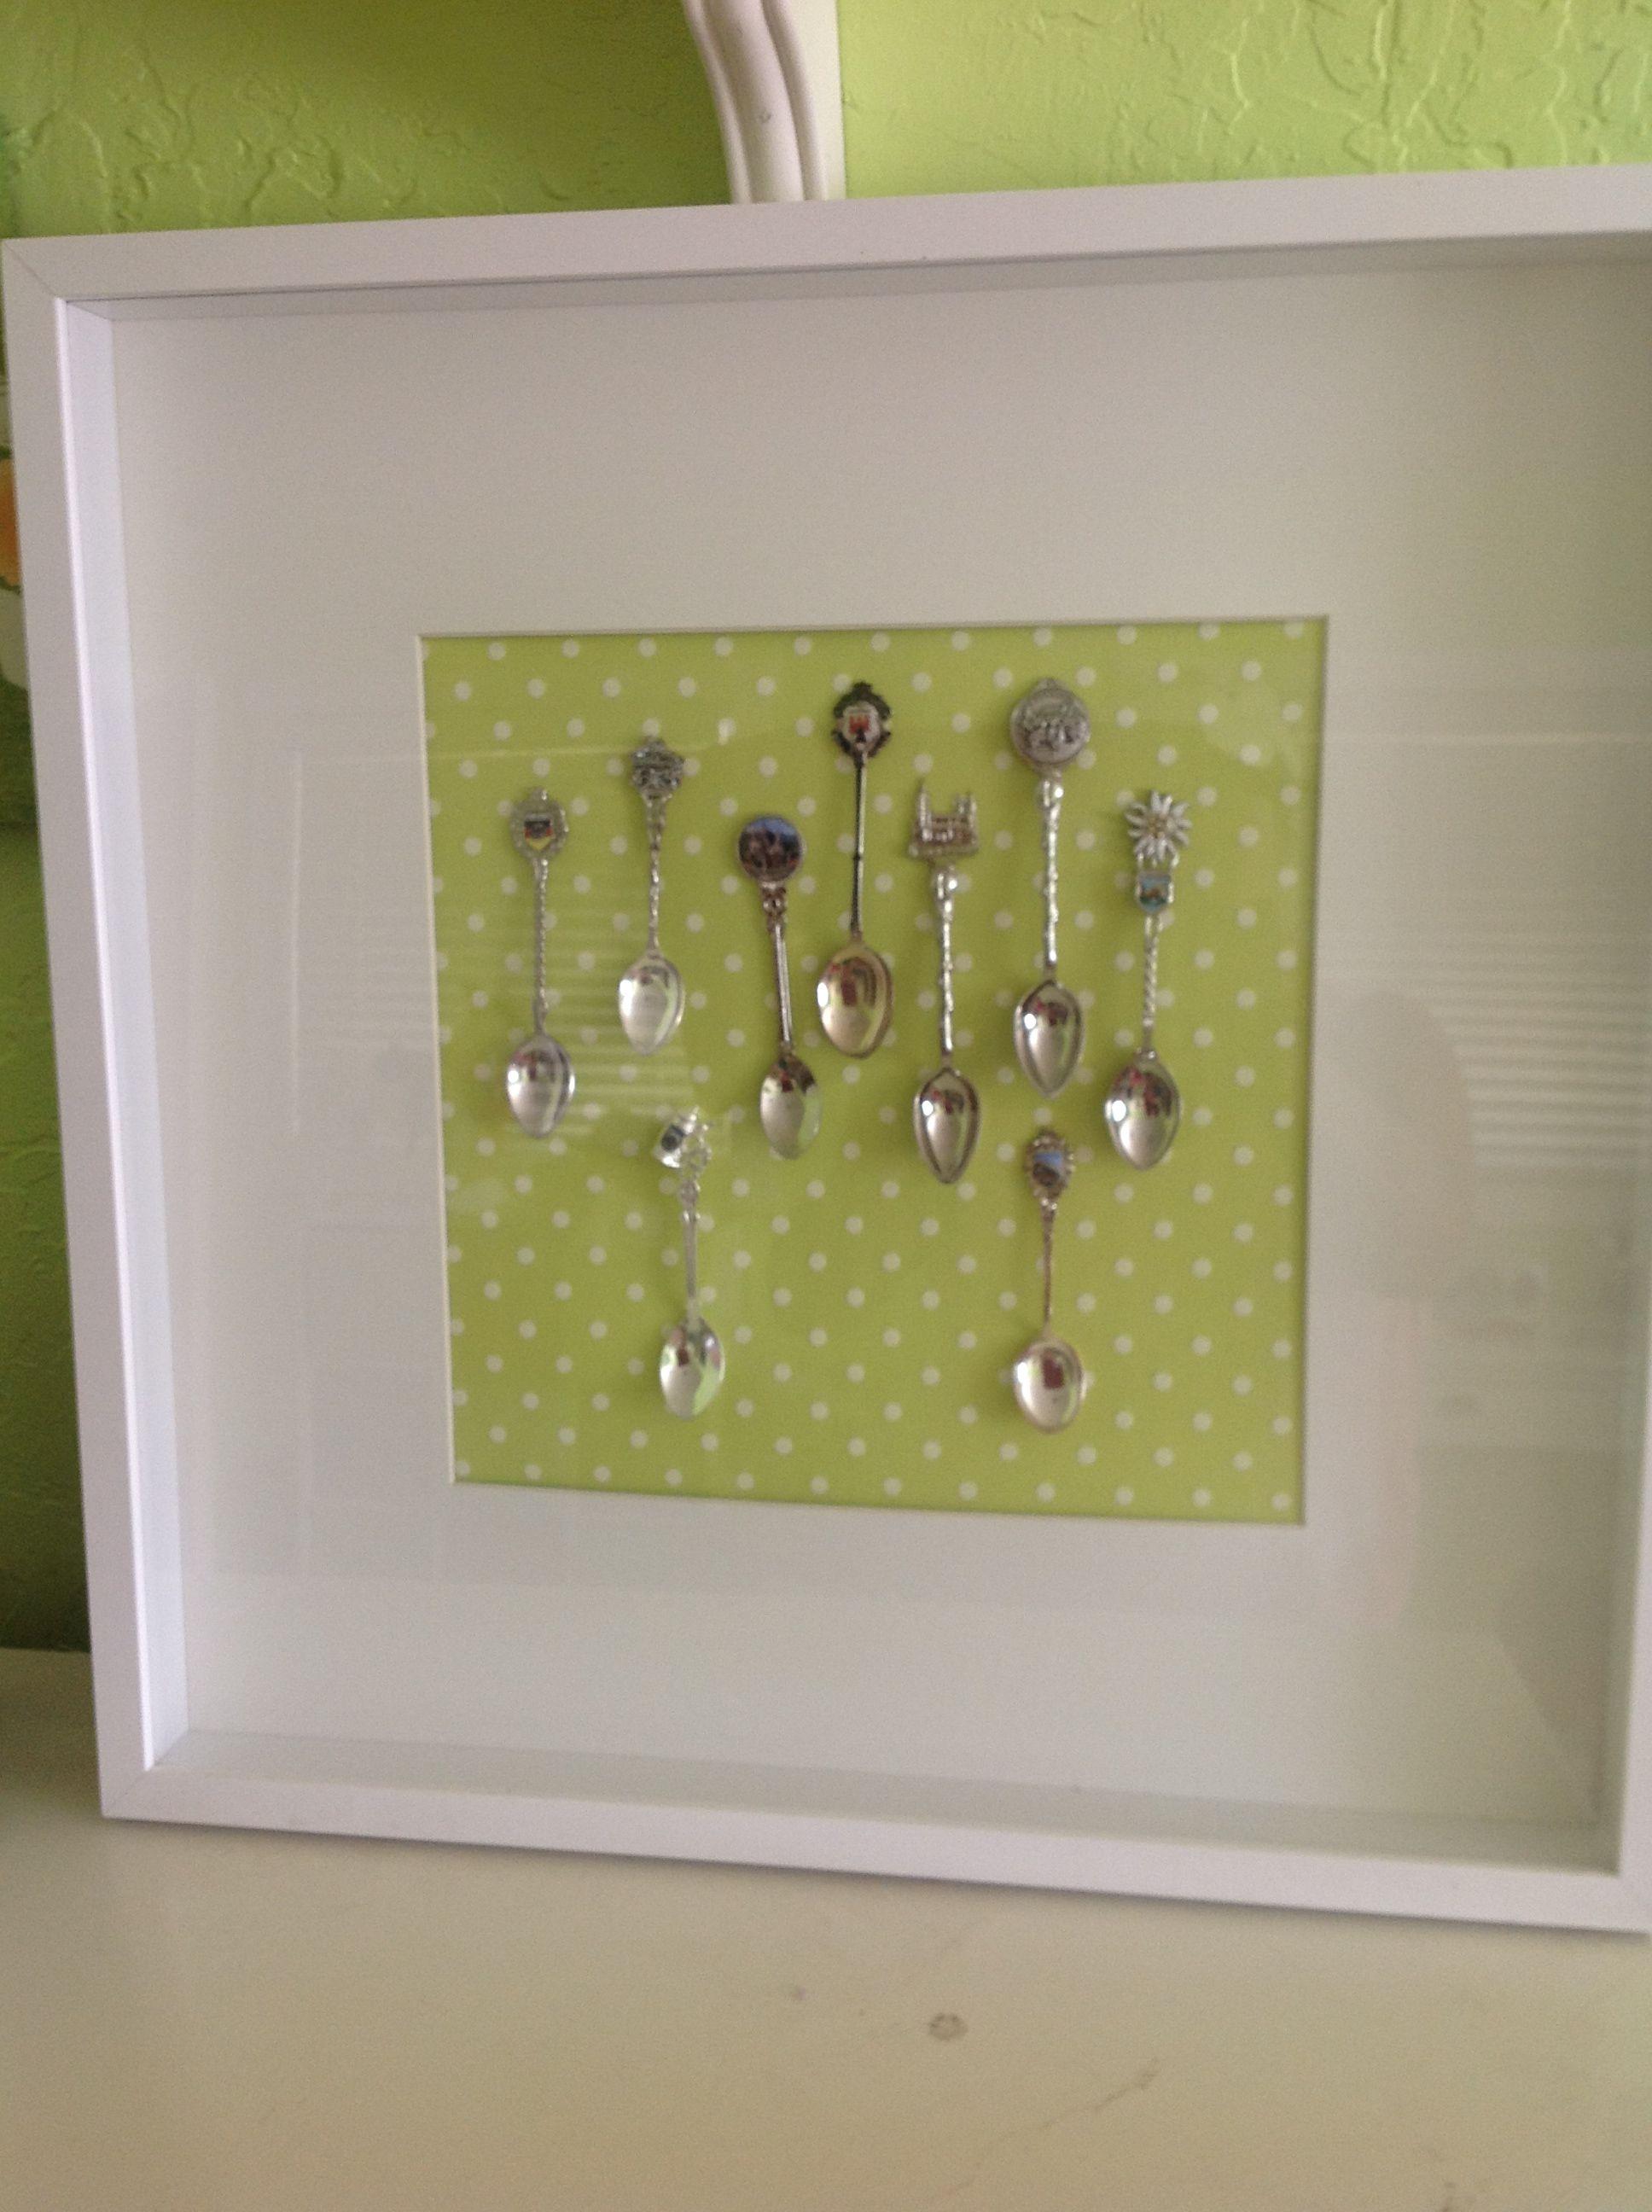 Souvenir Spoon Display Cheap Frame From Ikea Scrapbook